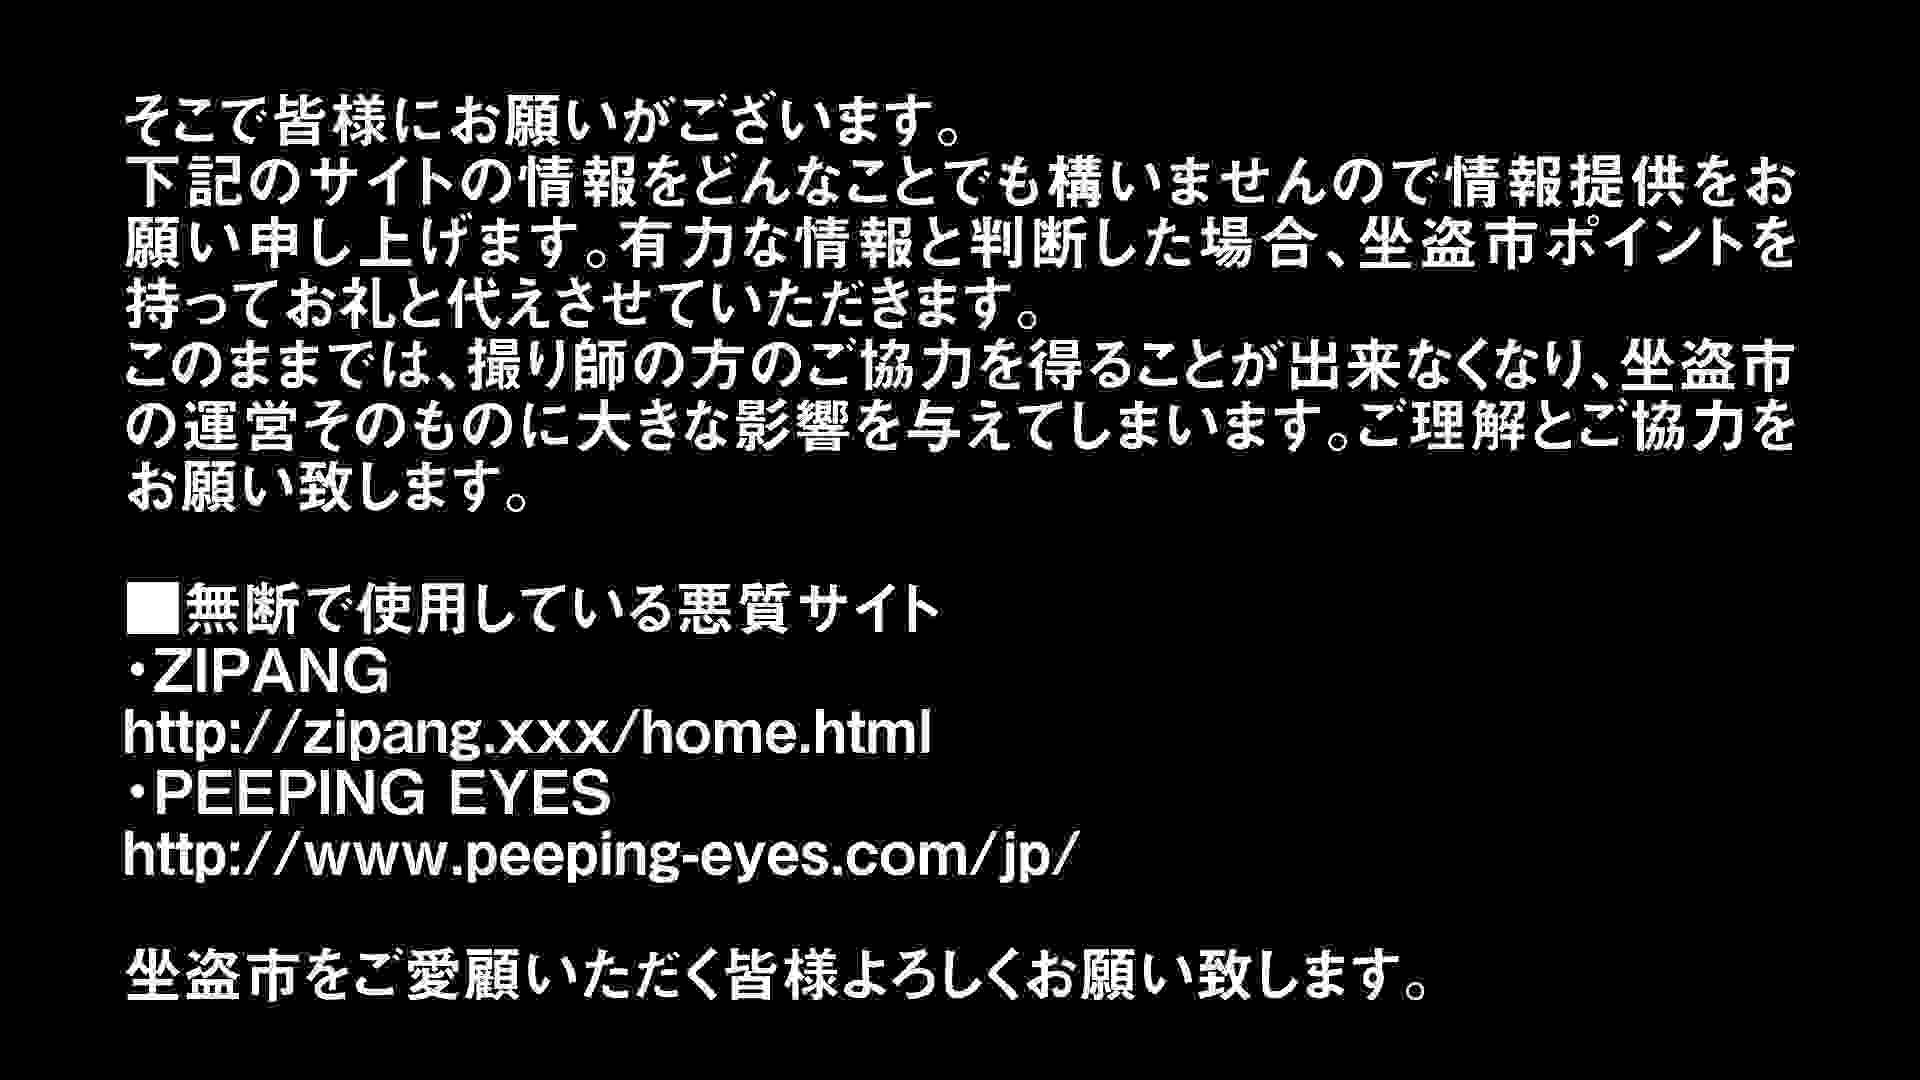 Aquaな露天風呂Vol.298 女体盗撮 | OL女体  60連発 22